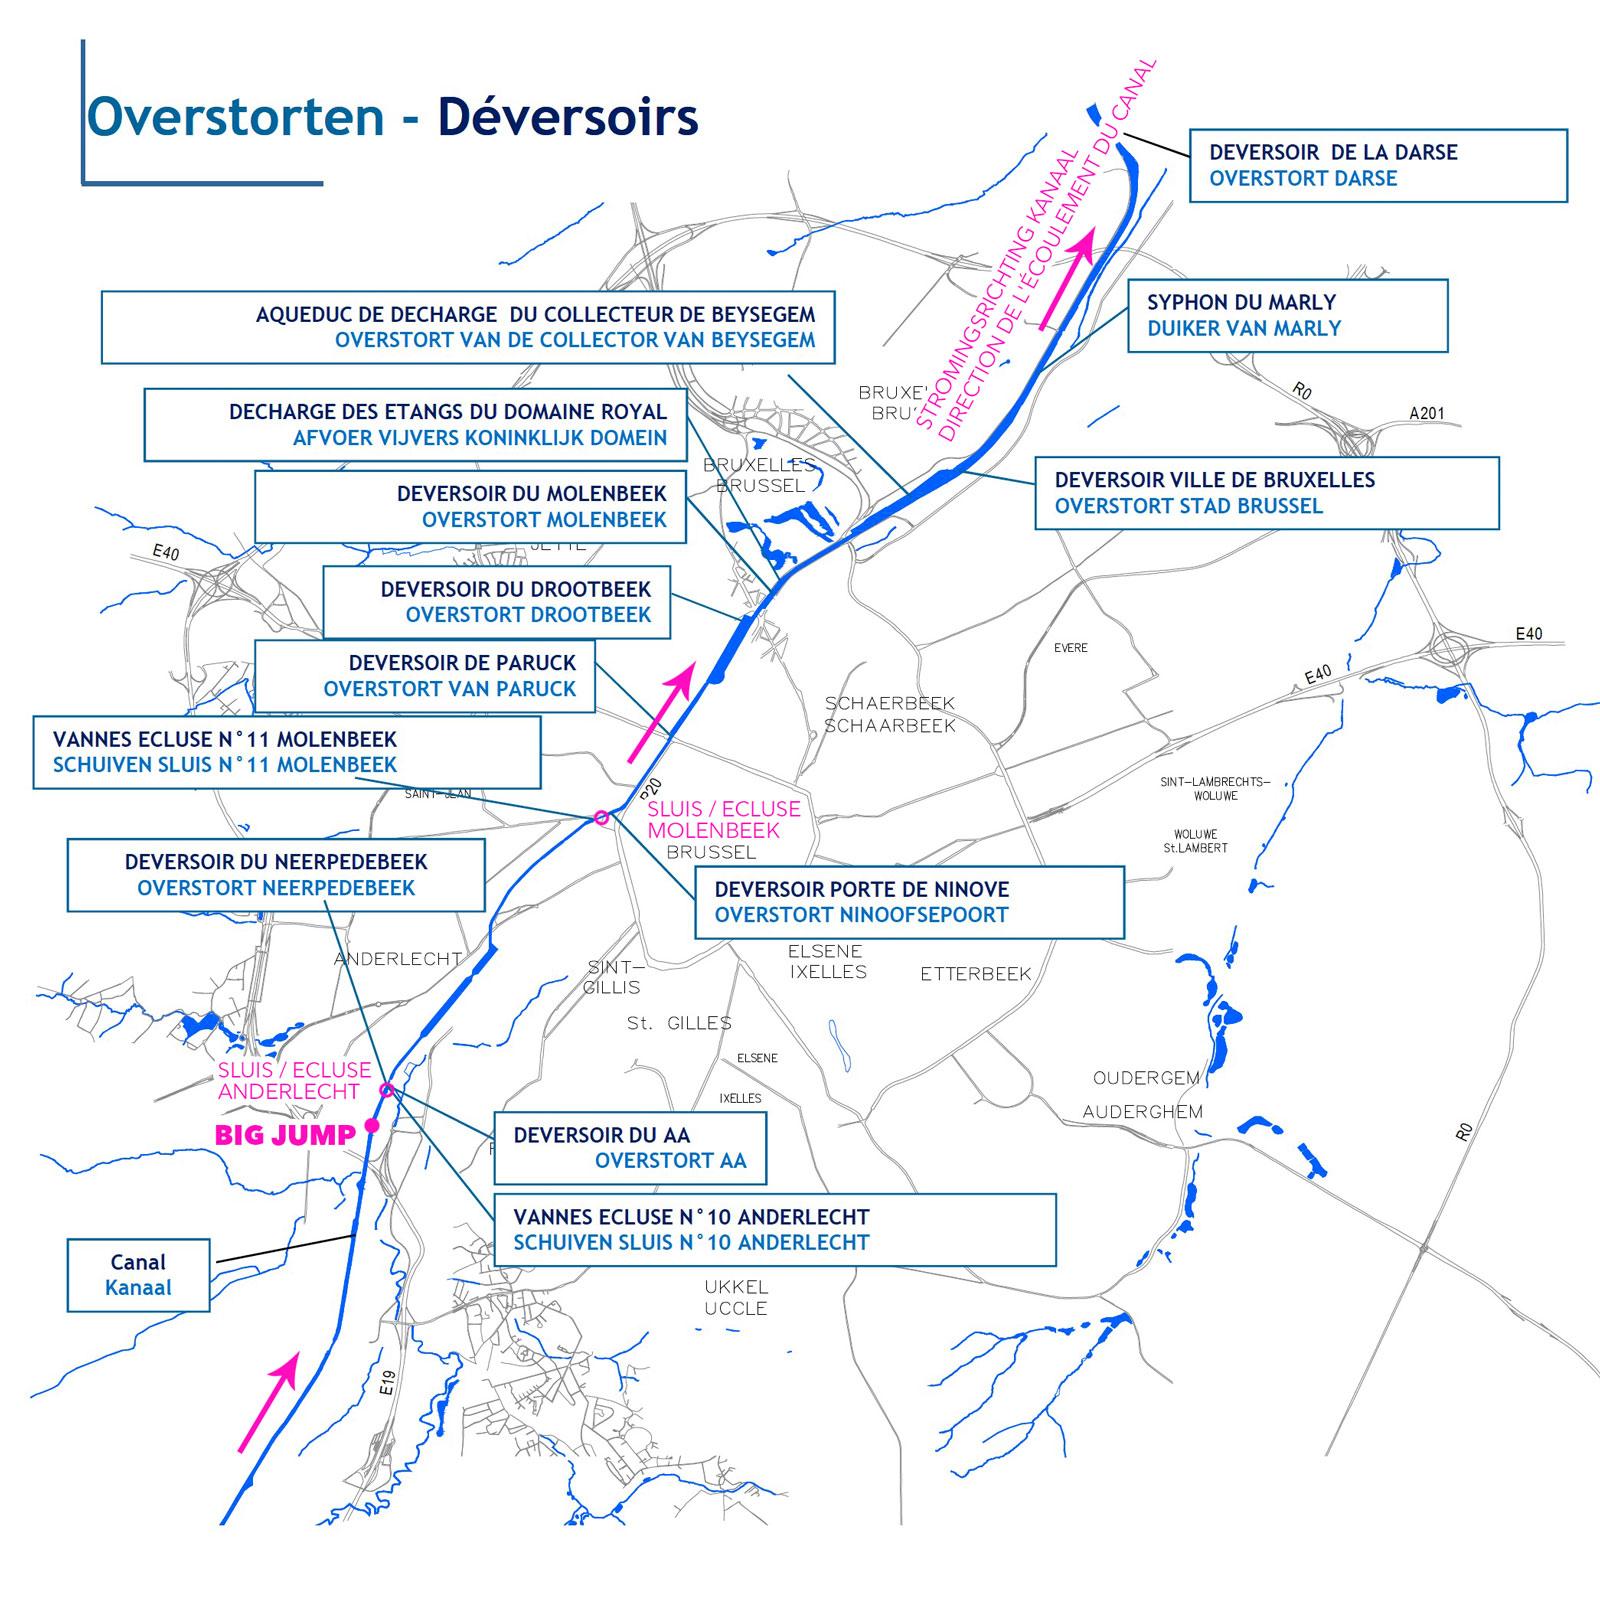 The canal in Brussels and the overflows of the sewage system. All of them are situated downstream of the place of the BIG JUMP. Le canal à Bruxelles et les déversoirs du système d'égouts. Tous sont situés en aval de la place du BIG JUMP. Het kanaal in Brussel en de overlopen van de riolering. Ze bevinden zich allemaal stroomafwaarts van de plaats van de BIG JUMP.